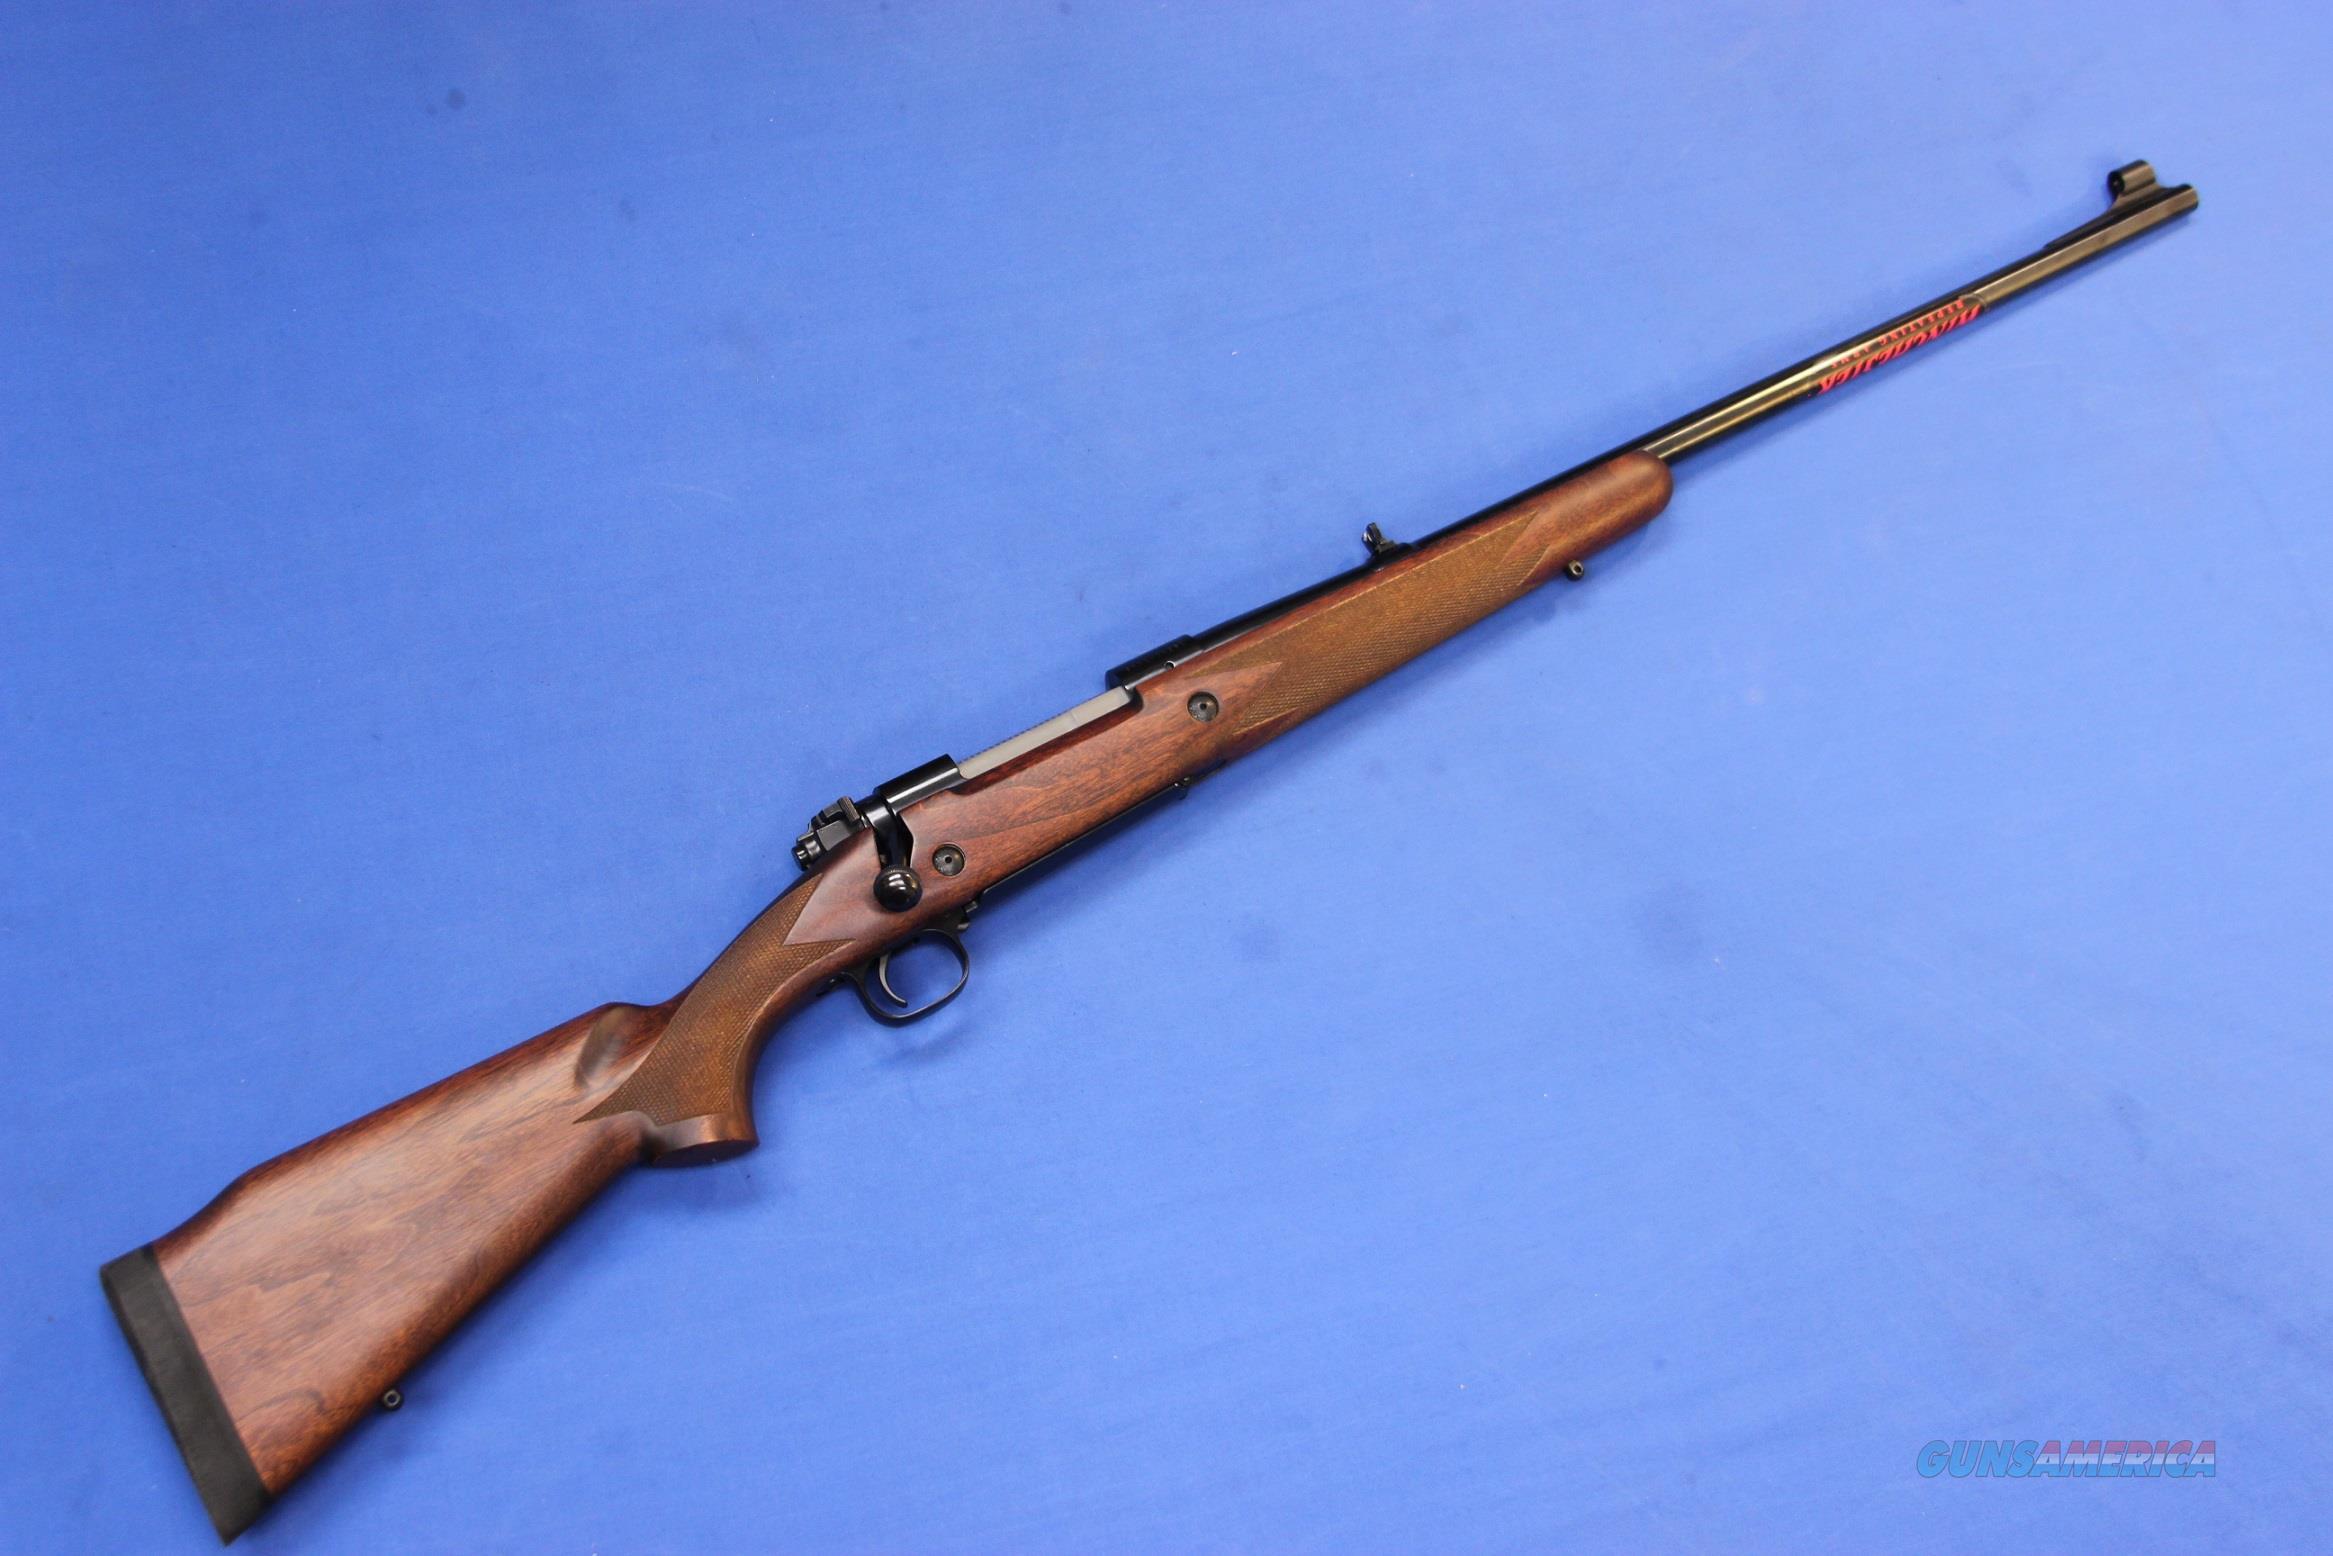 Current model Winchester Model 70 assembled by FN Viana in Portugal. (Picture courtesy gunsamerica.com).